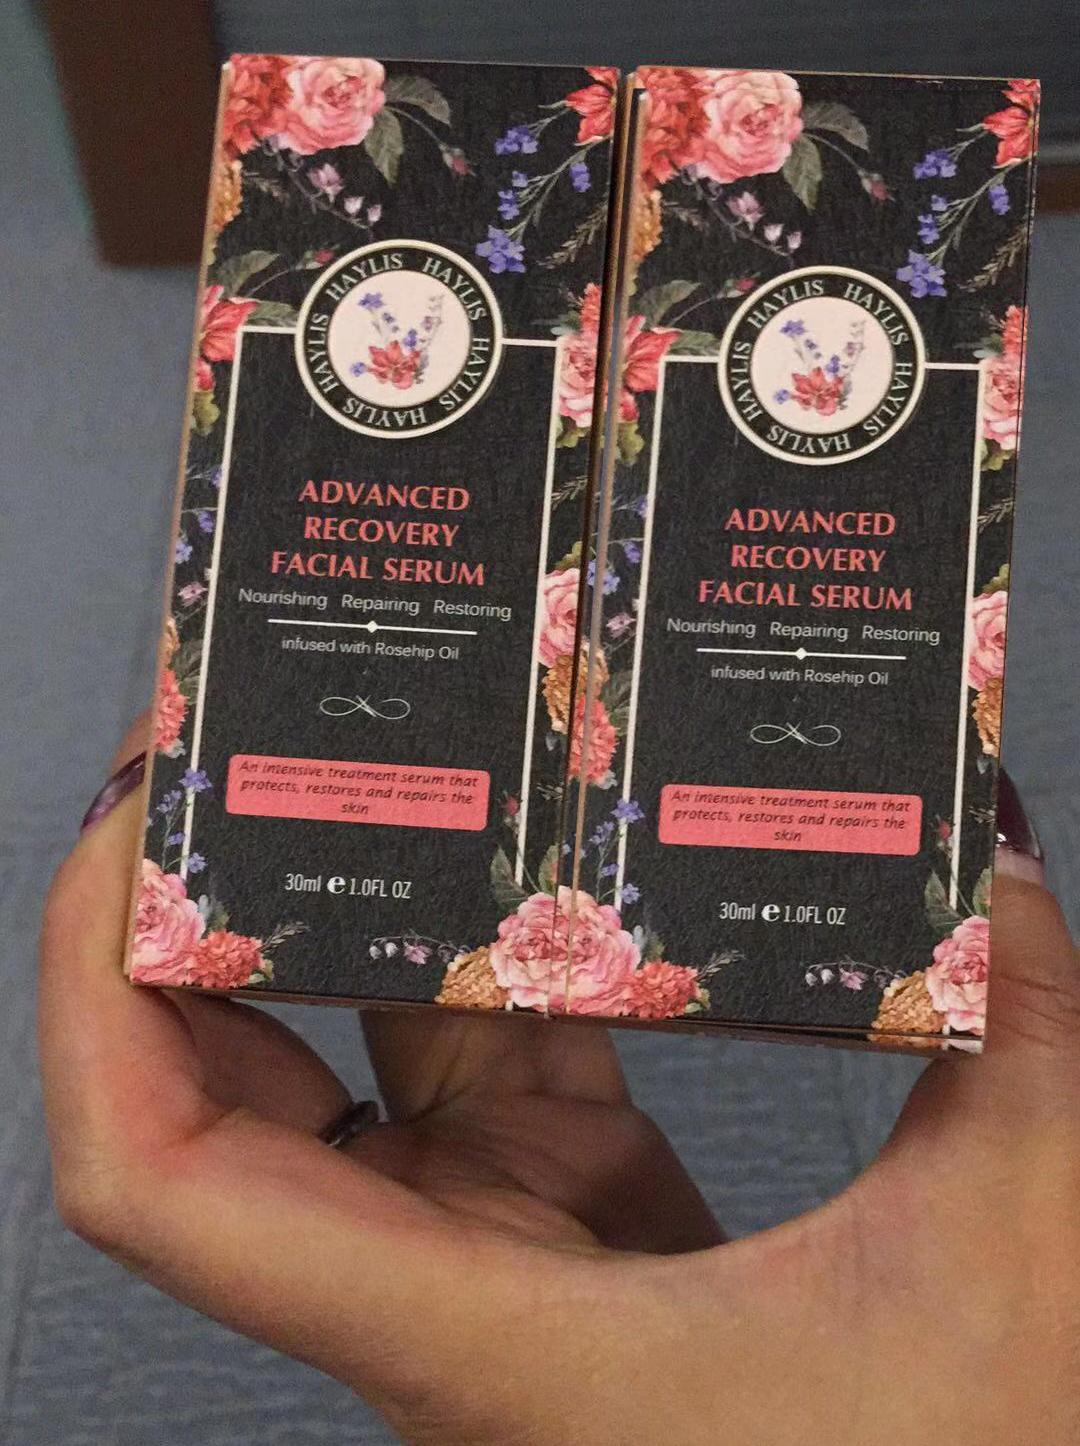 澳洲 haylis ADVANCED  RECOVERY 精华30ml